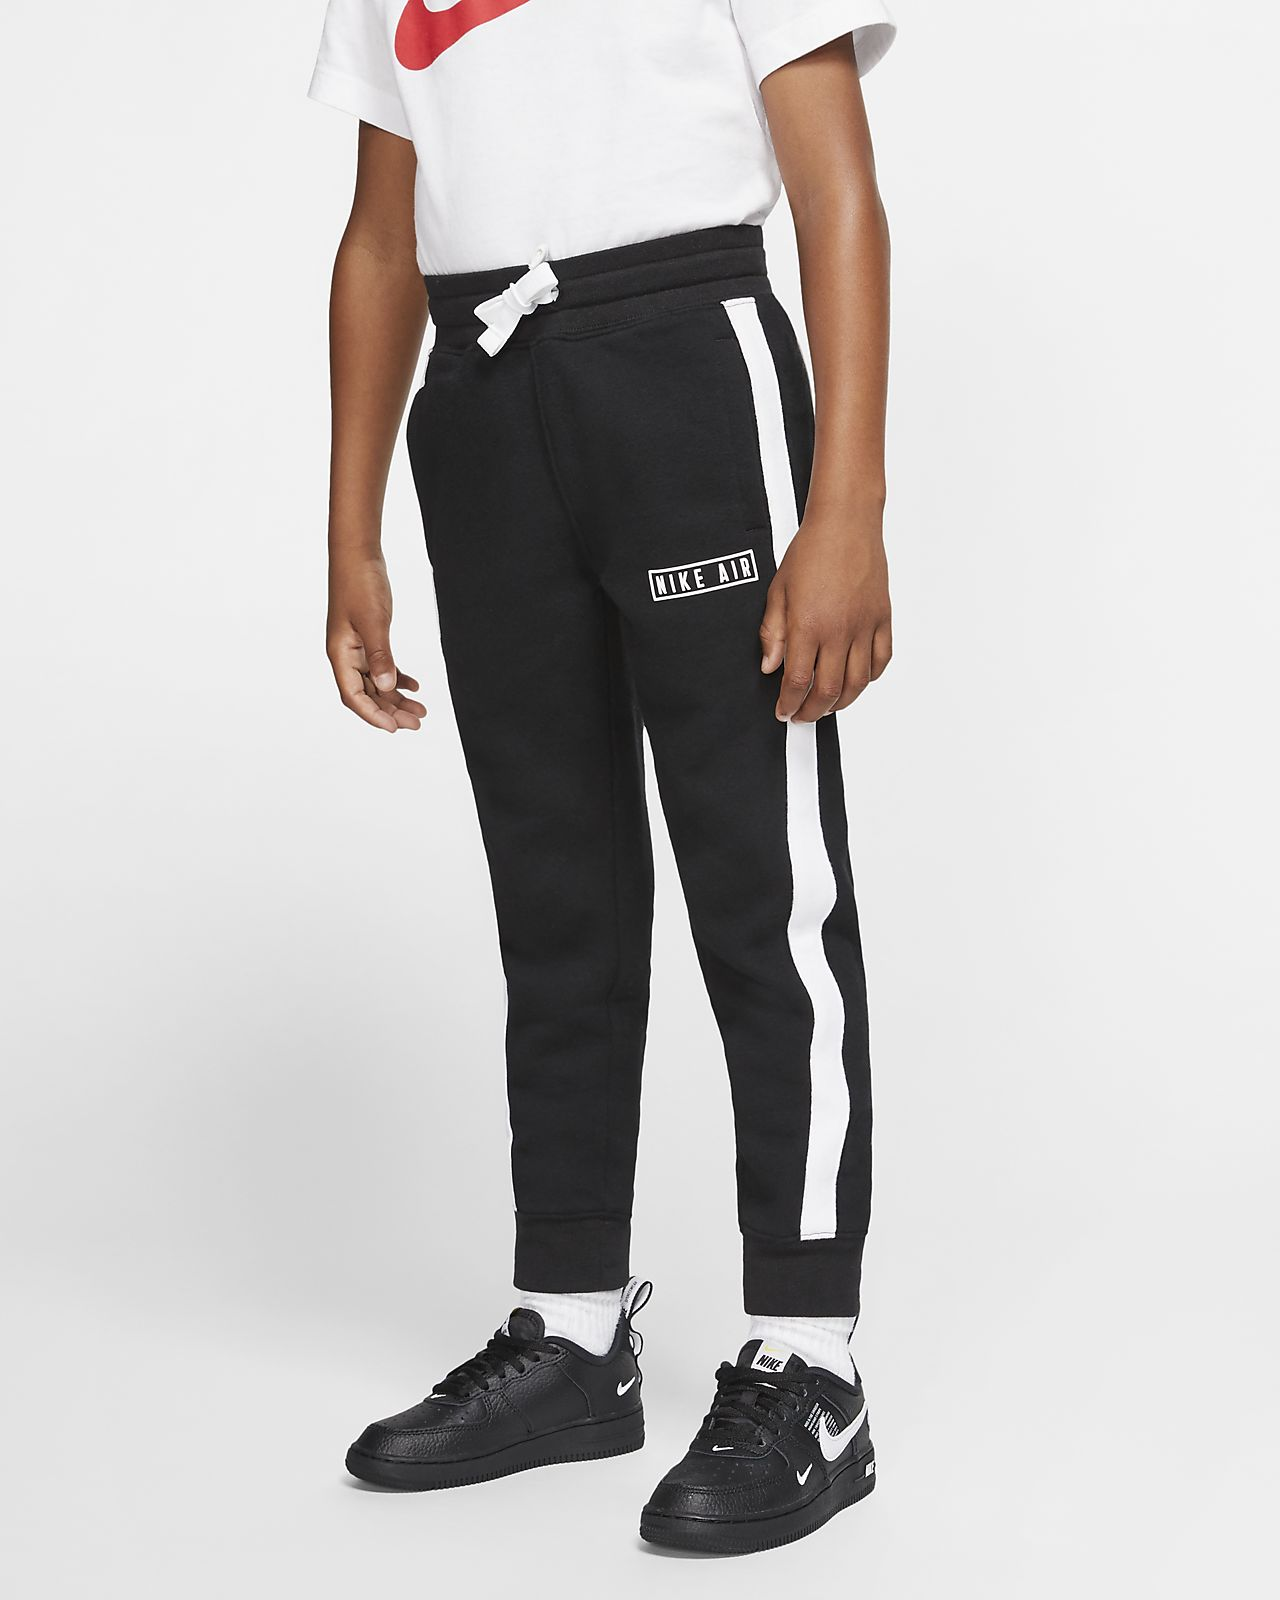 Nike Air Younger Kids' Fleece Joggers